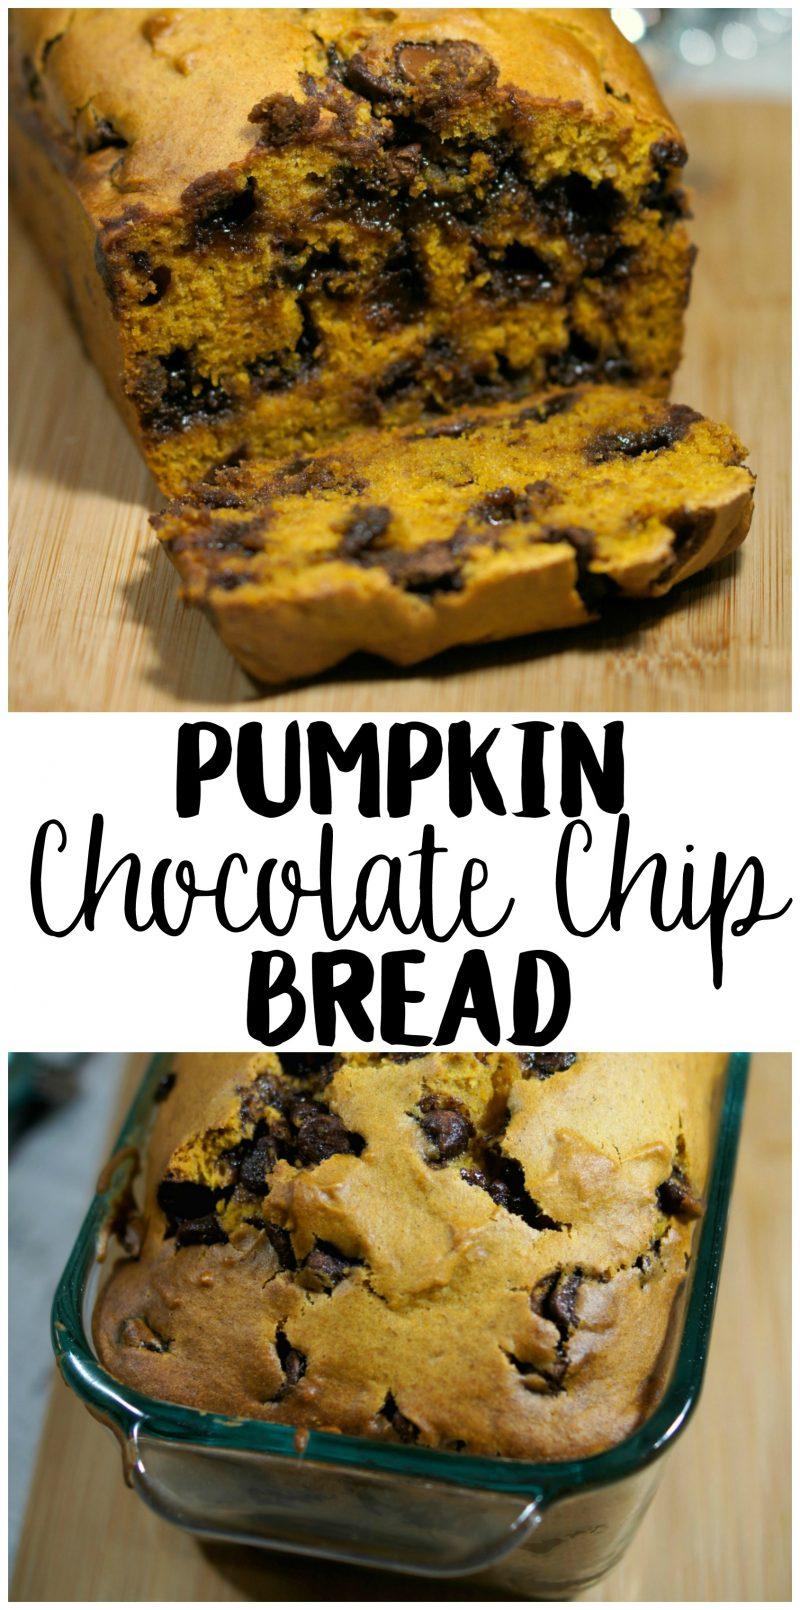 Easy Pumpkin Chocolate Chip Bread Recipe - Susie Homemaker